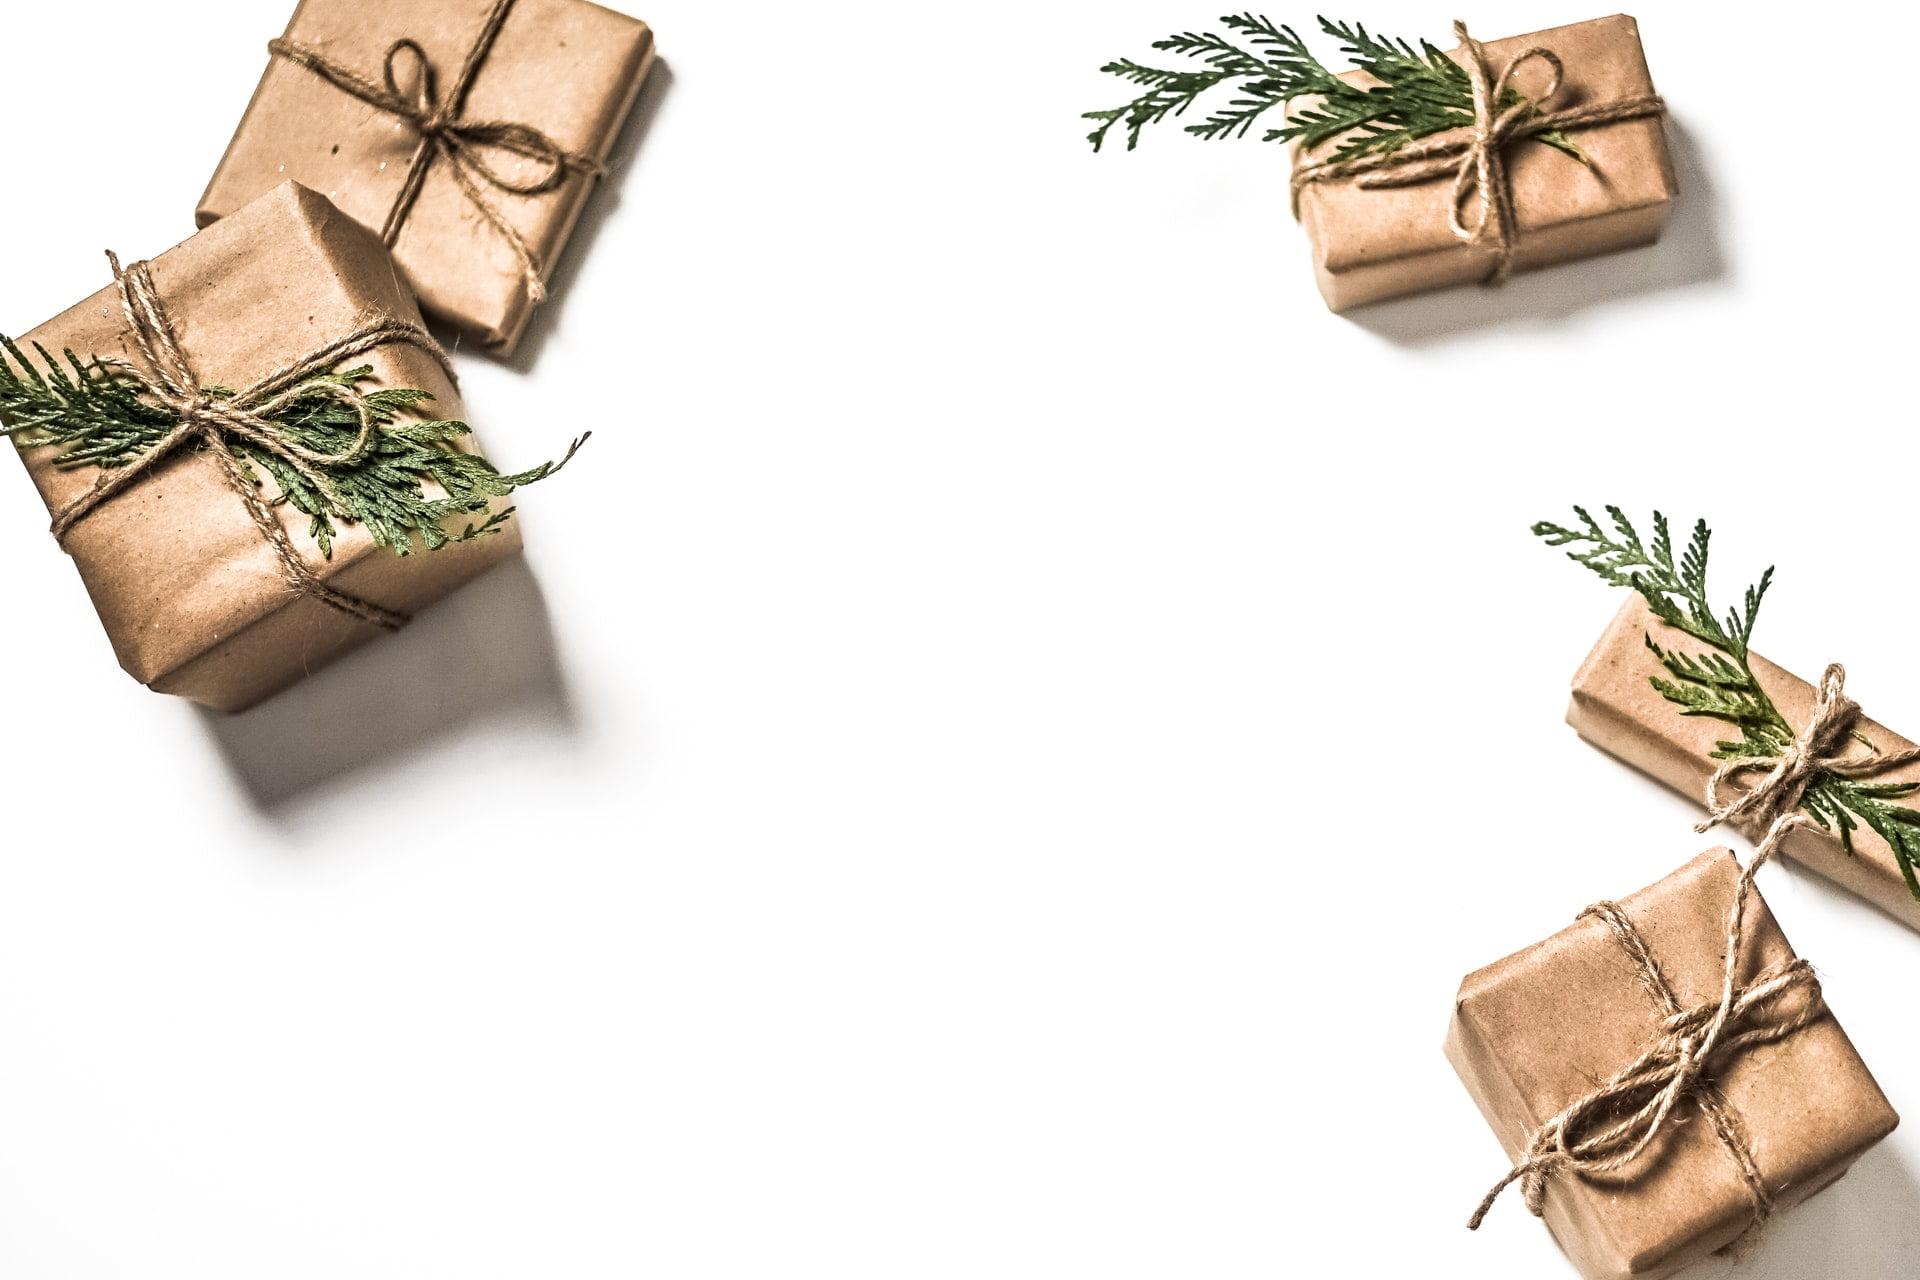 Forslag til bæredygtige julegaver